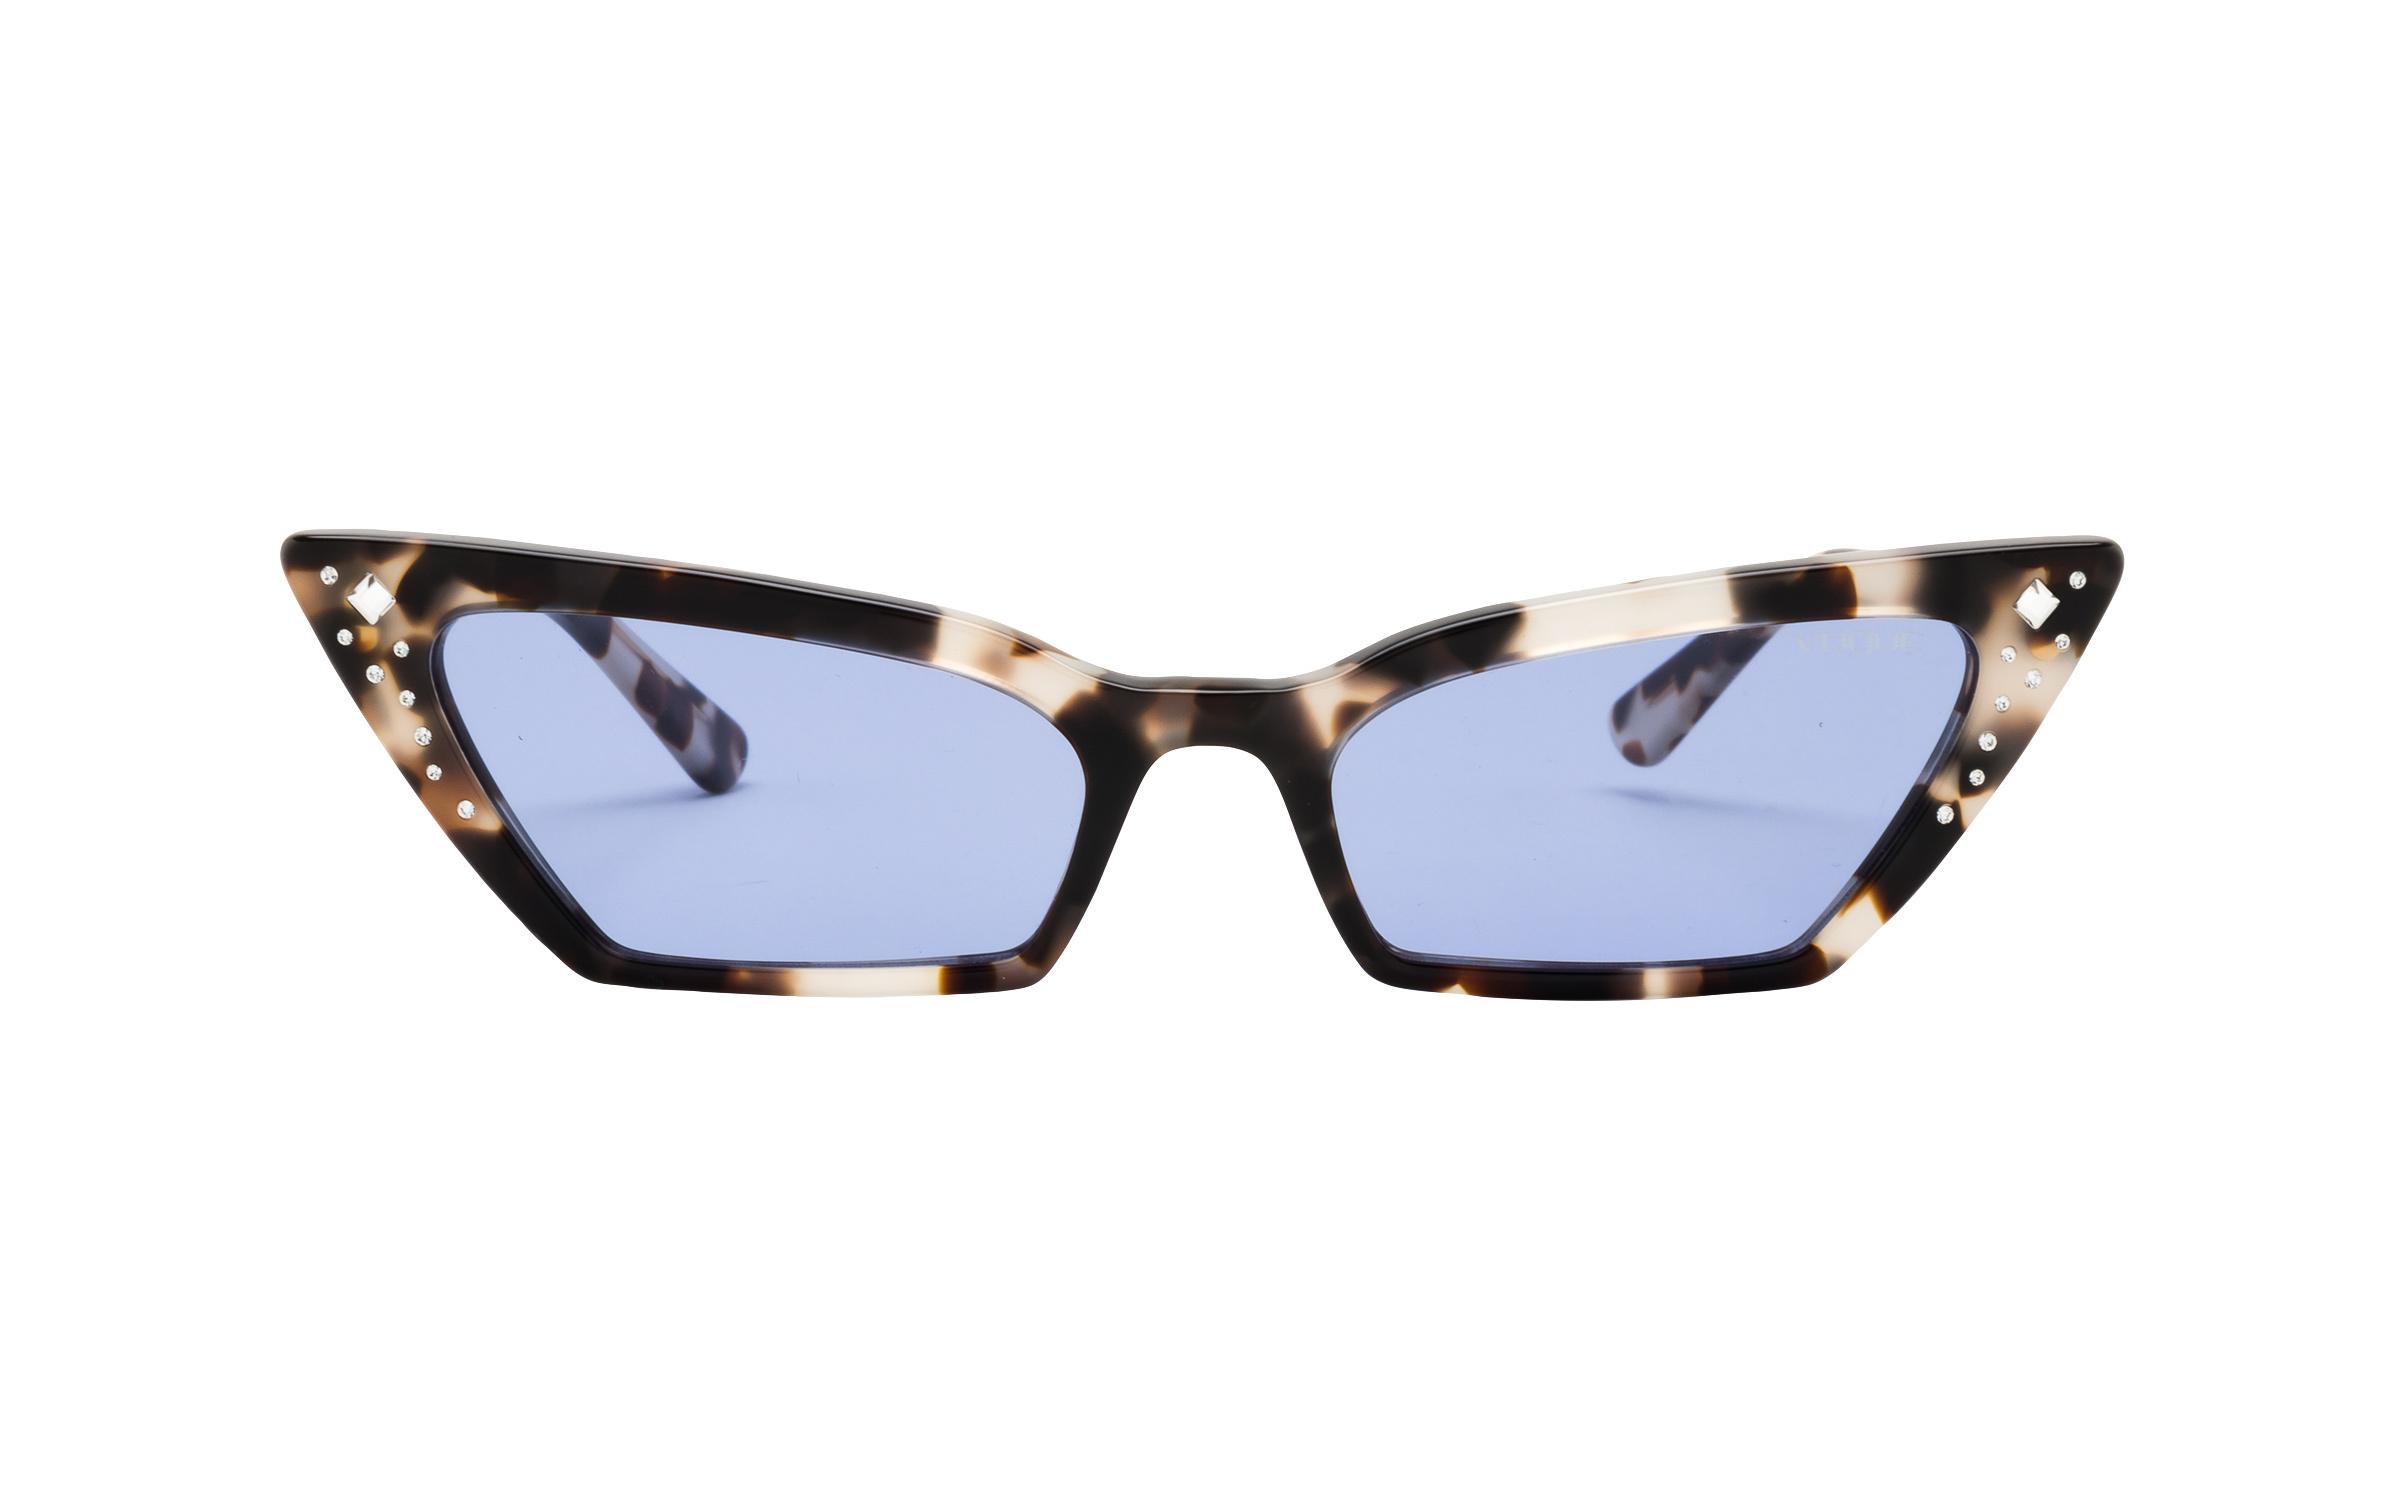 http://www.coastal.com/ - Luxottica Vogue VO5282-SB 272276 54 Sunglasses in Brown Grey Havana White/Tortoise – Online Coastal